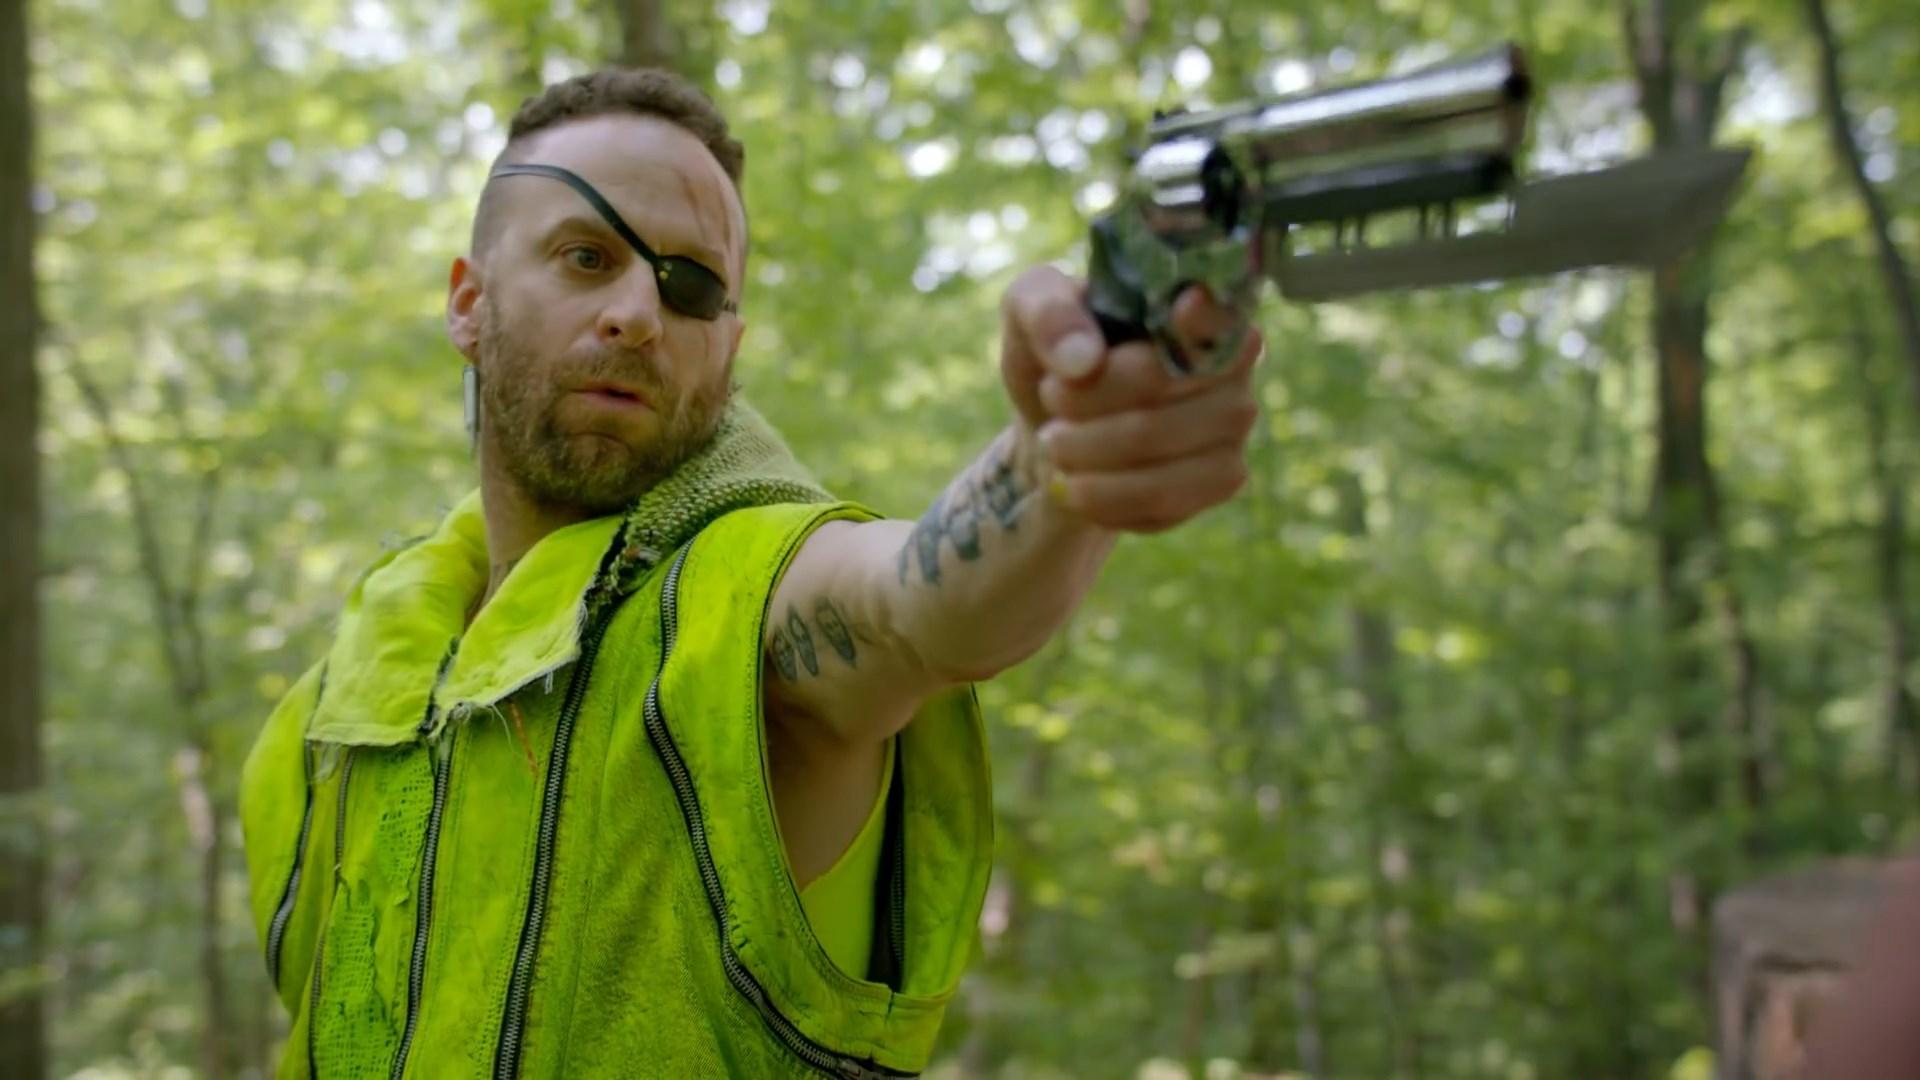 Neon Joe, Werewolf Hunter: Adult Swim Series Returns in